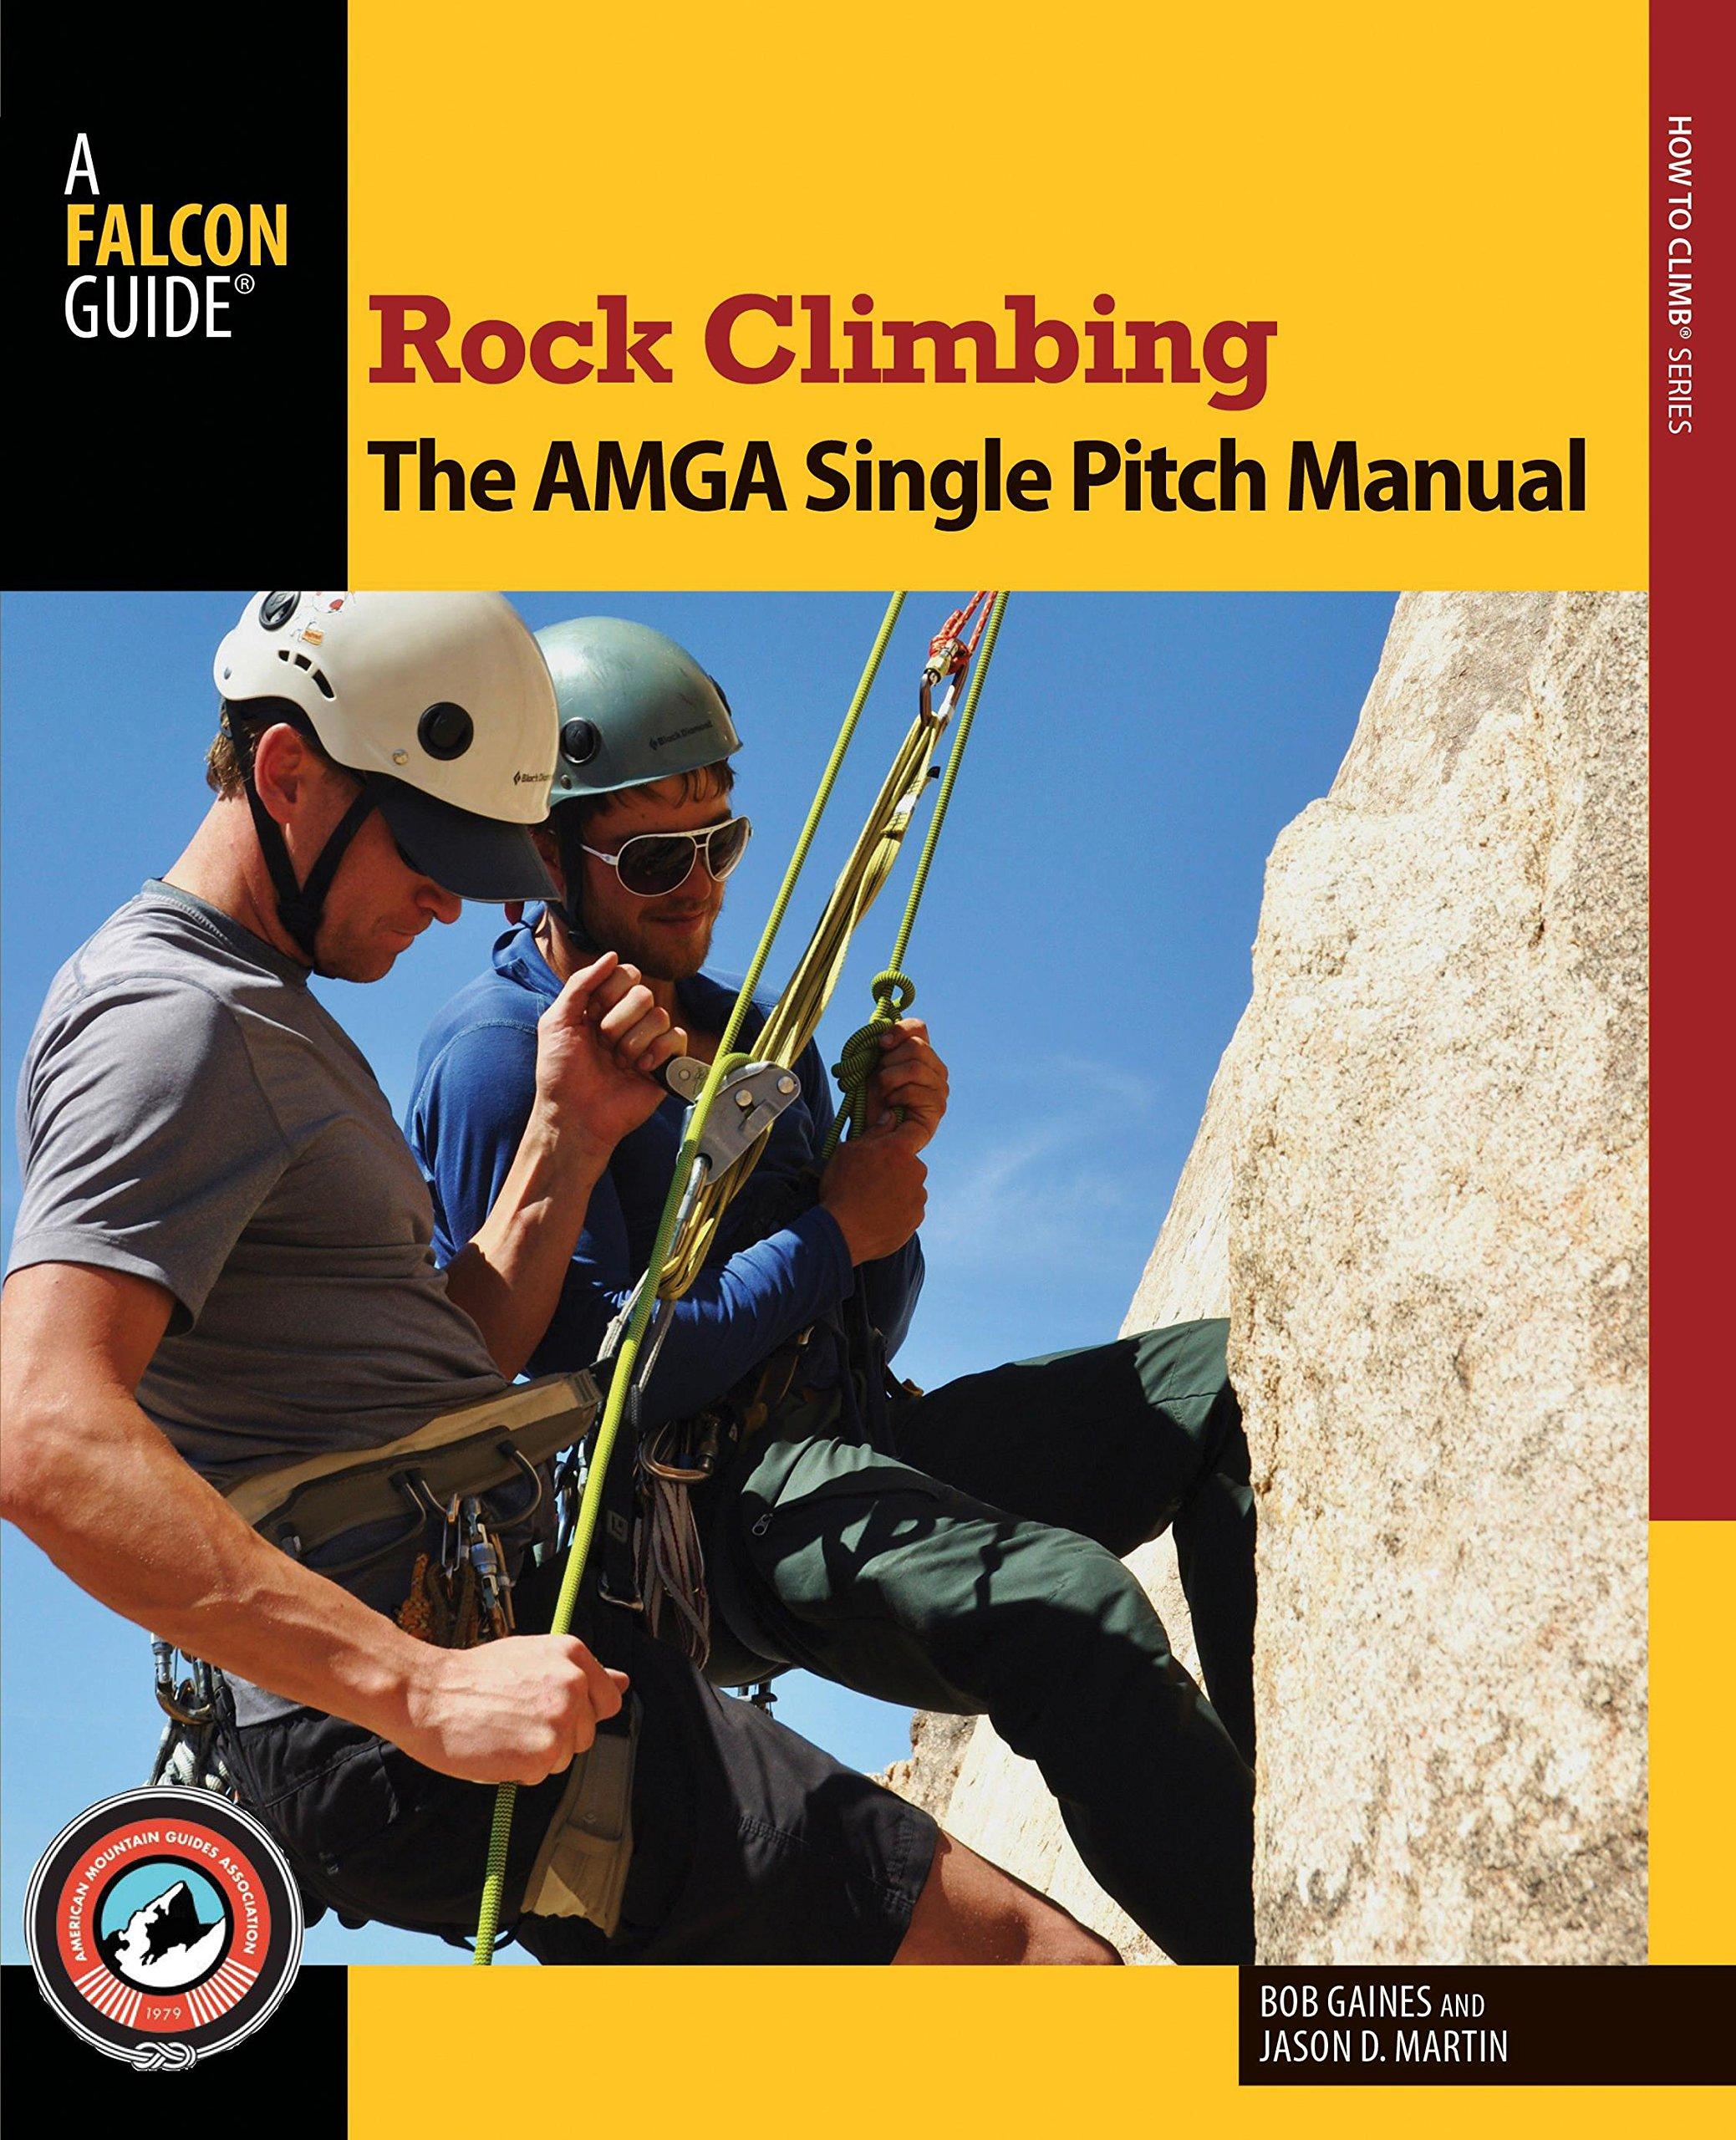 rock climbing the amga single pitch manual how to climb series rh amazon com Amga Physician Compensation Survey Amga Physician Compensation Survey